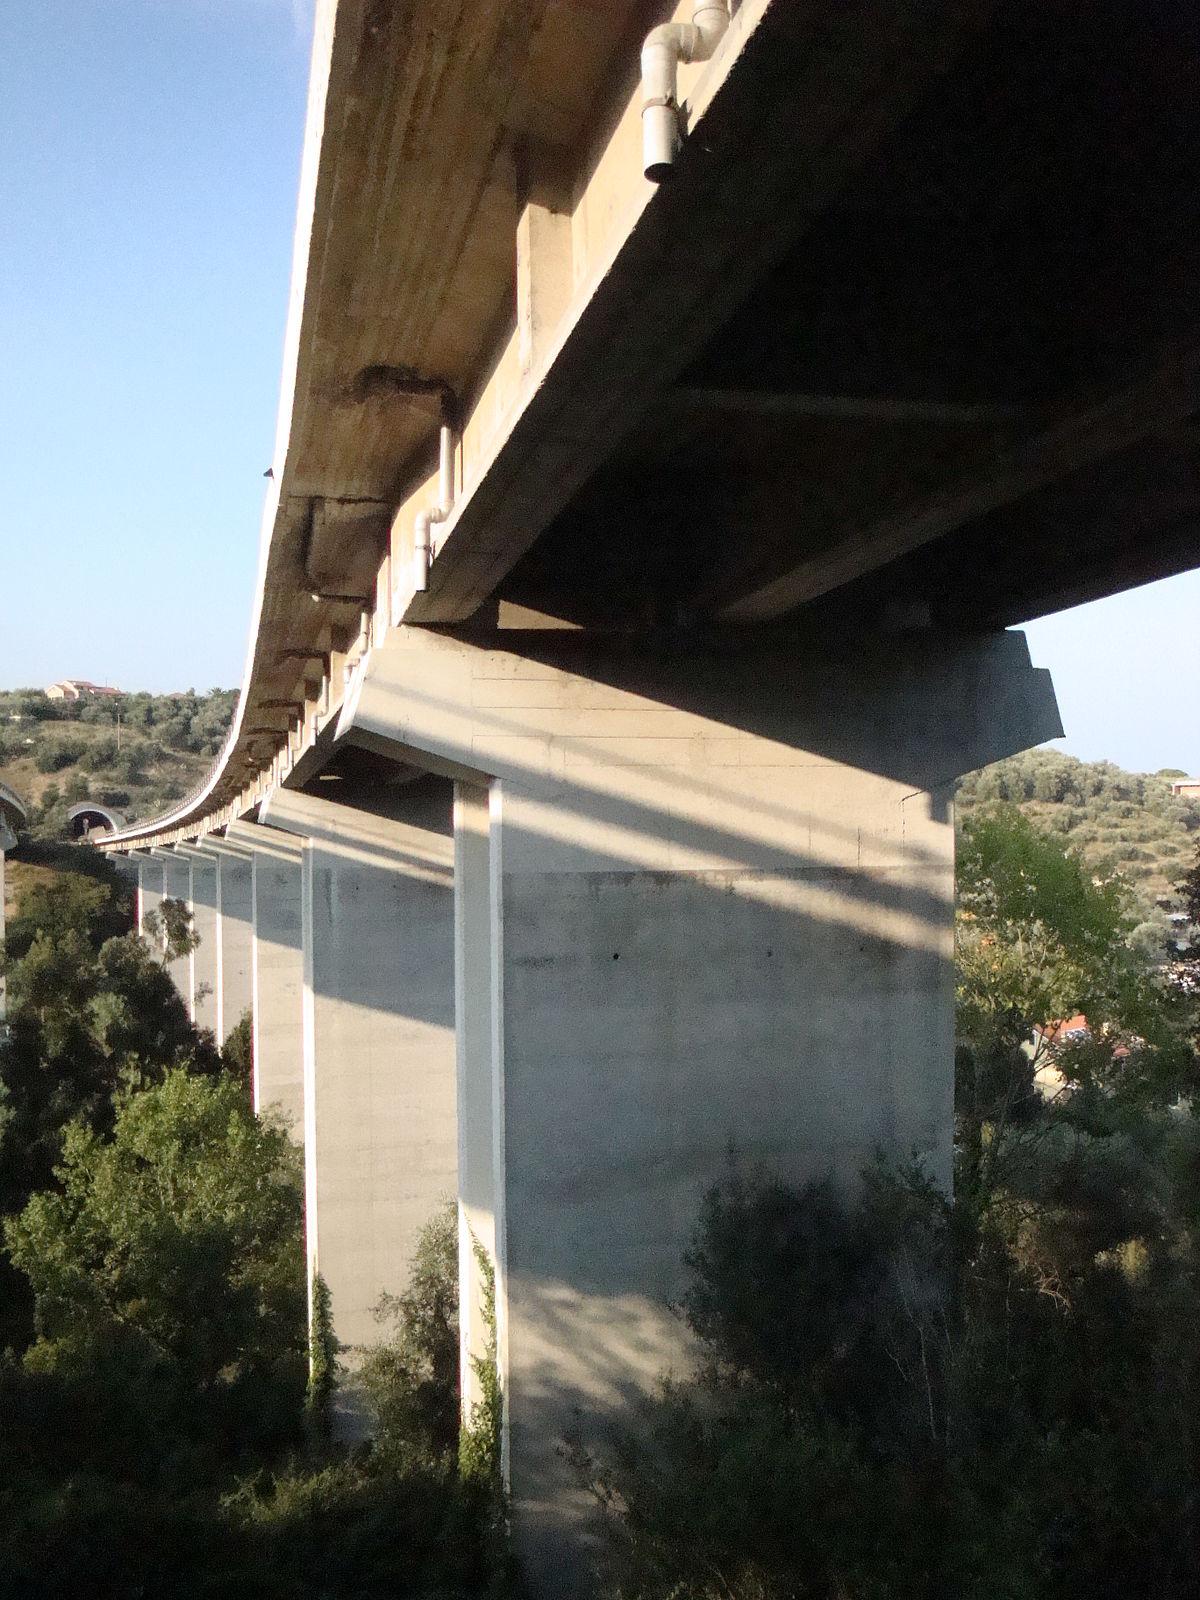 Autostrada A 10 - Diano Marina - Foto di Tony Frisina - Alessandria - DSC06856.JPG